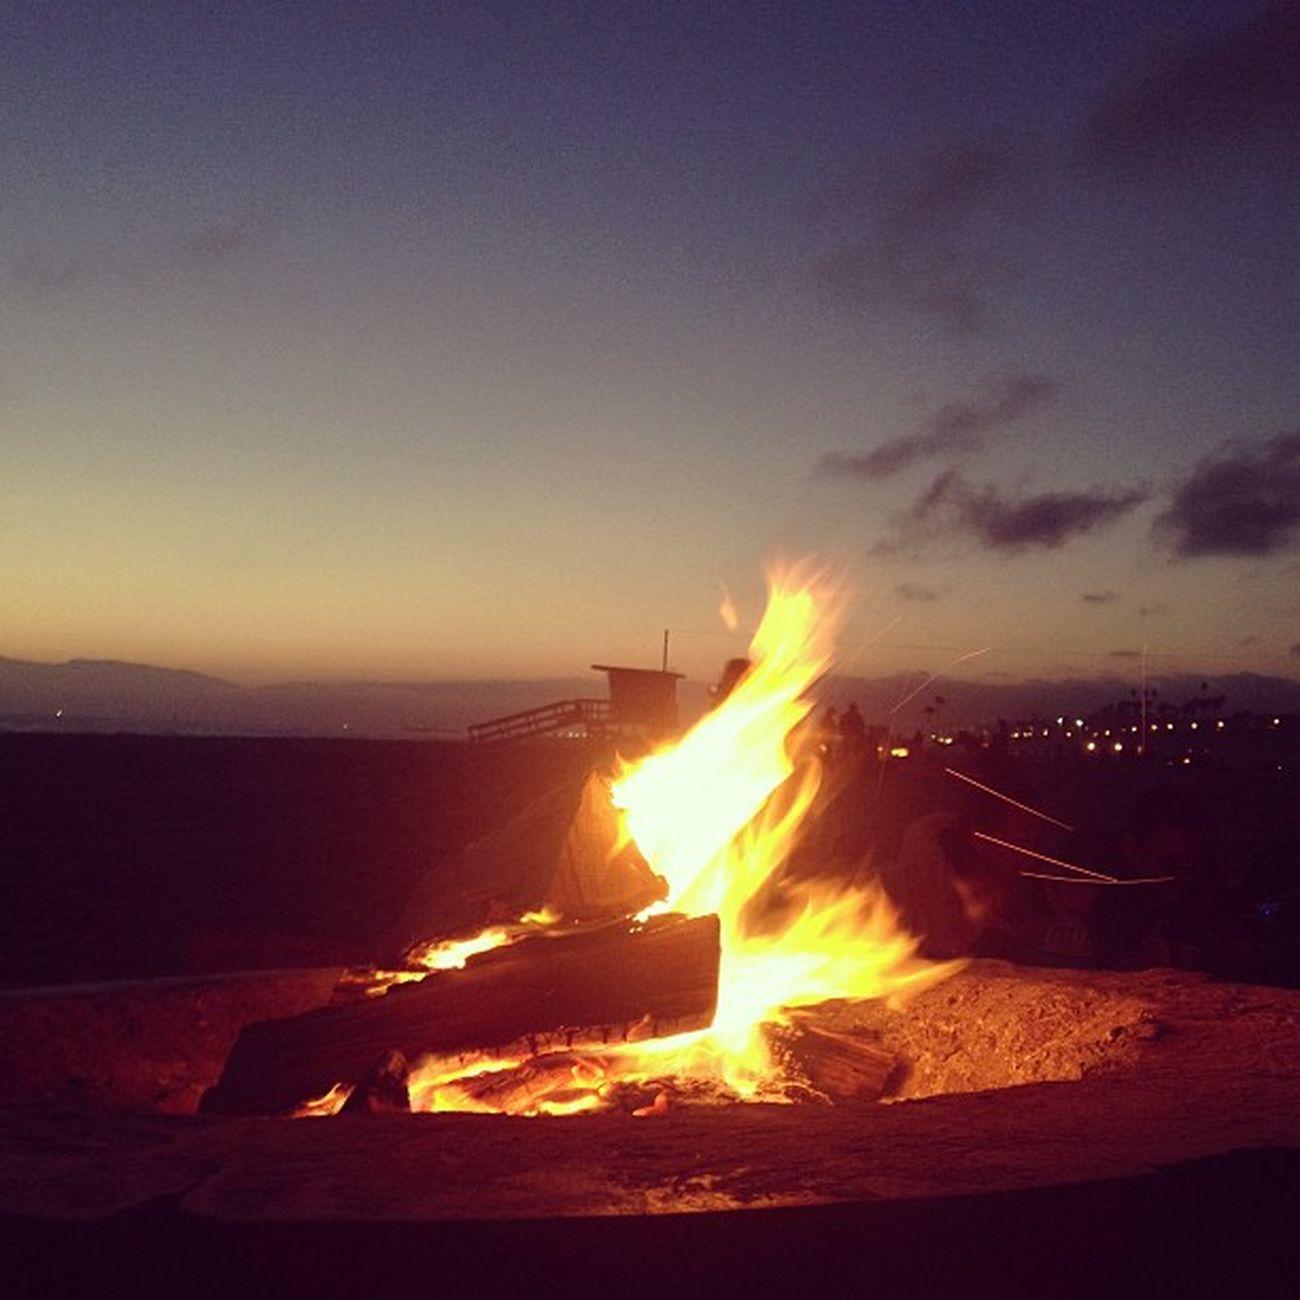 BURNBABYBURN Fire Bonfire Firepit Sanctuary Ocean Beach Friends TheGroup Nature